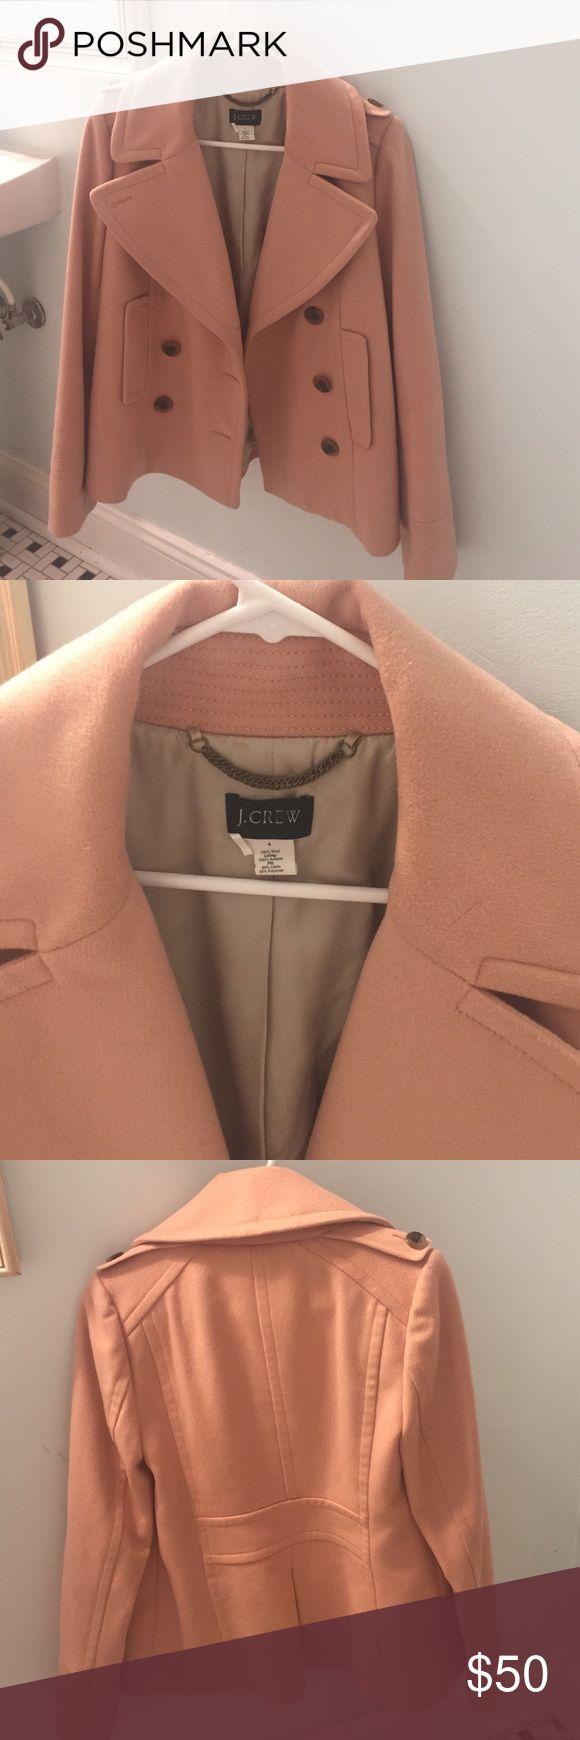 Mint Condition J crew Pea coat Sz 4 Mint Condition J Crew Pea coat size 4. Pink/Peach thick coat with tortoise shell buttons. J. Crew Jackets & Coats Pea Coats